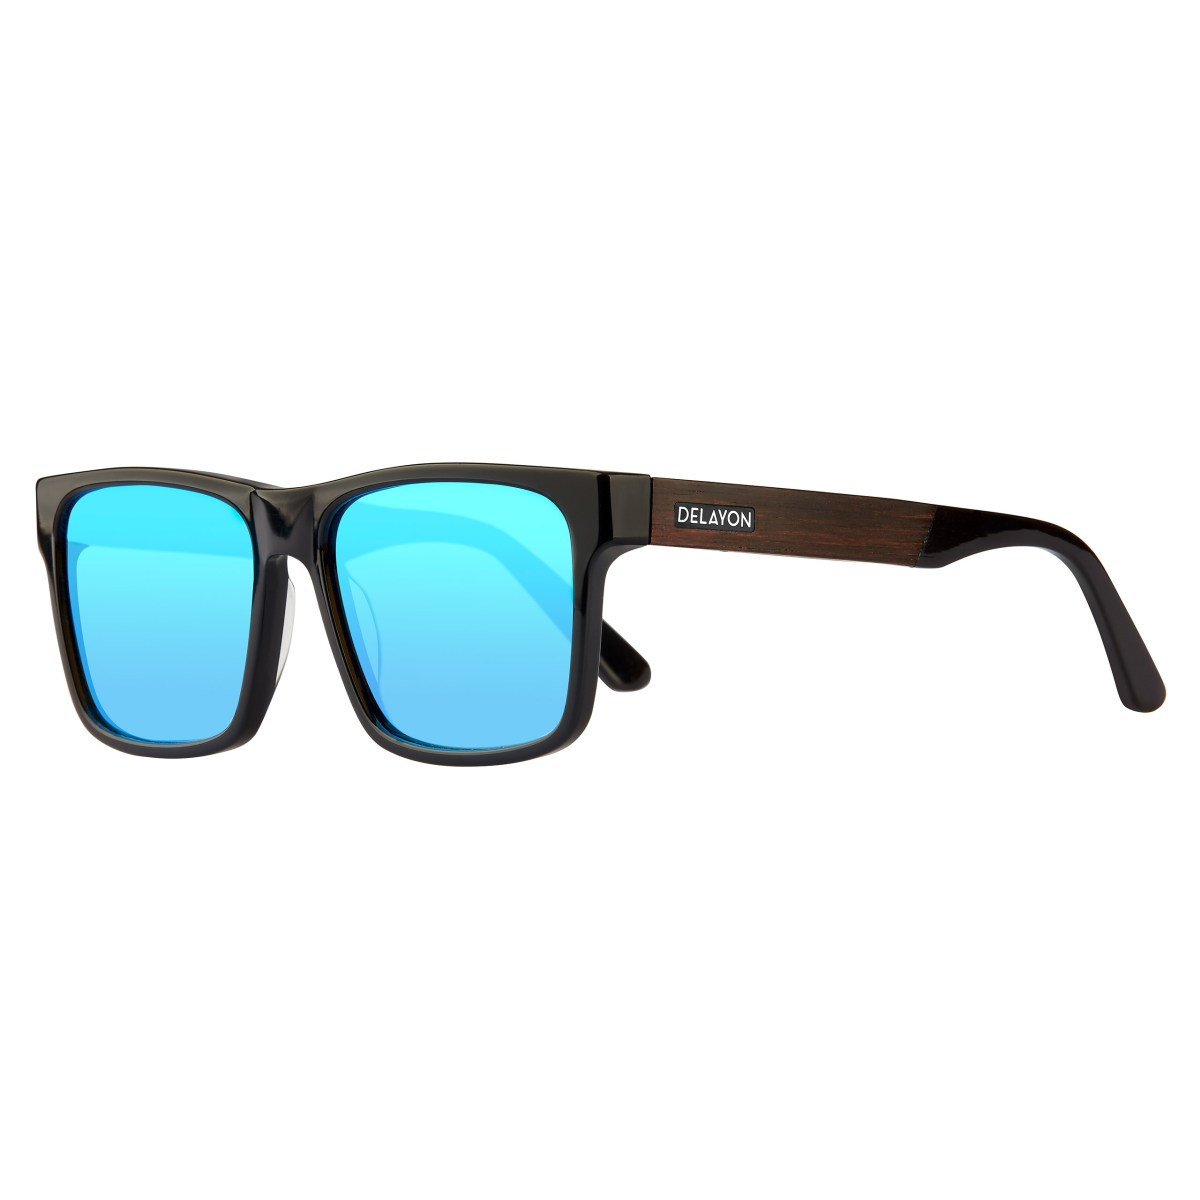 Delayon Eyewear Nomad Sunglass